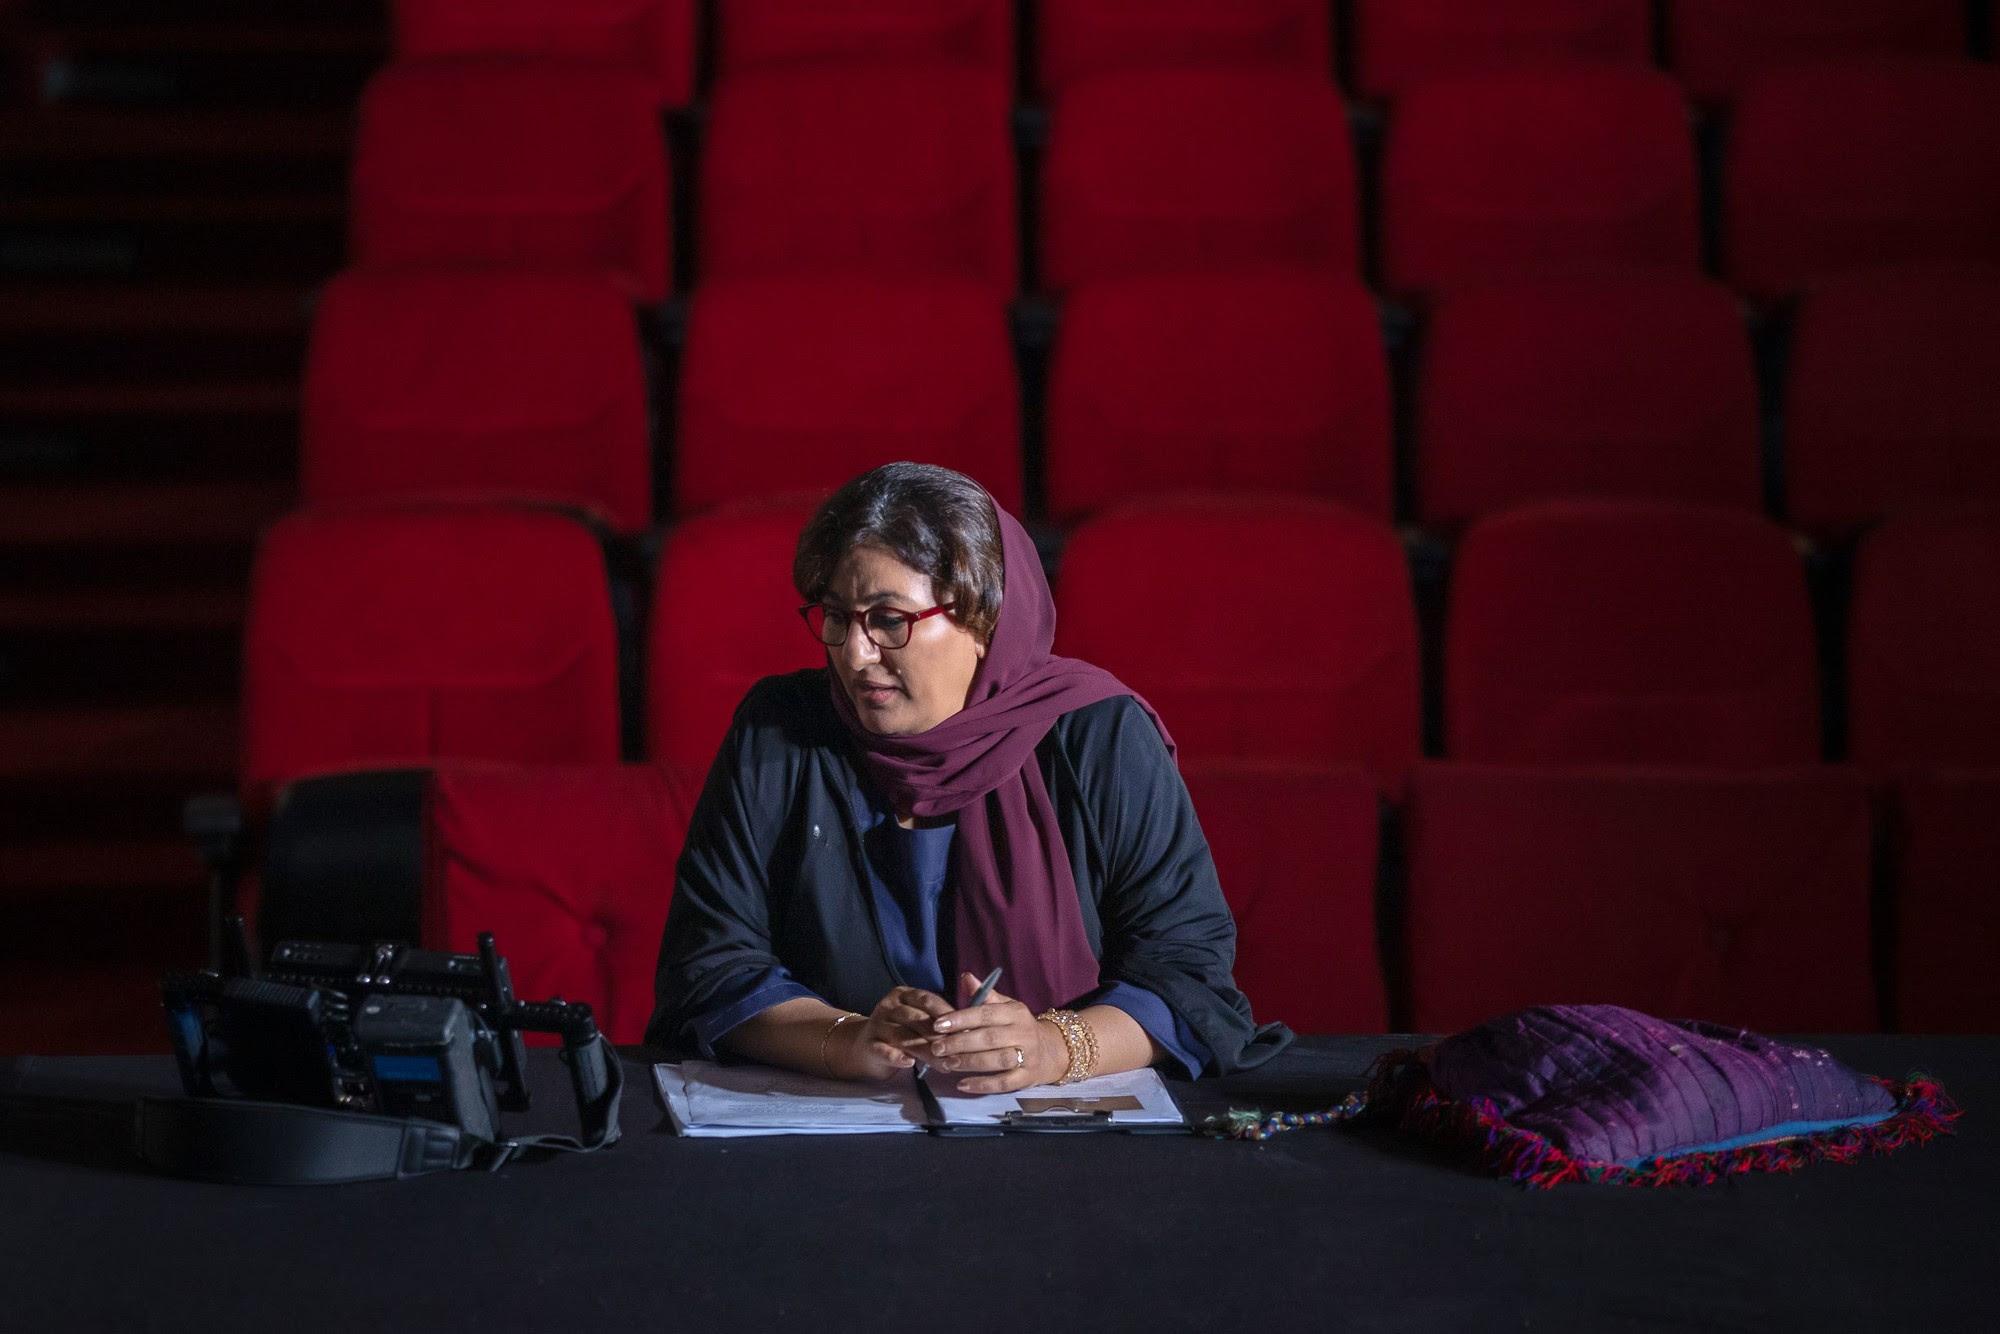 Nujoom Alghanem Will Represent United Arab Emirates at 2019 Venice Biennale